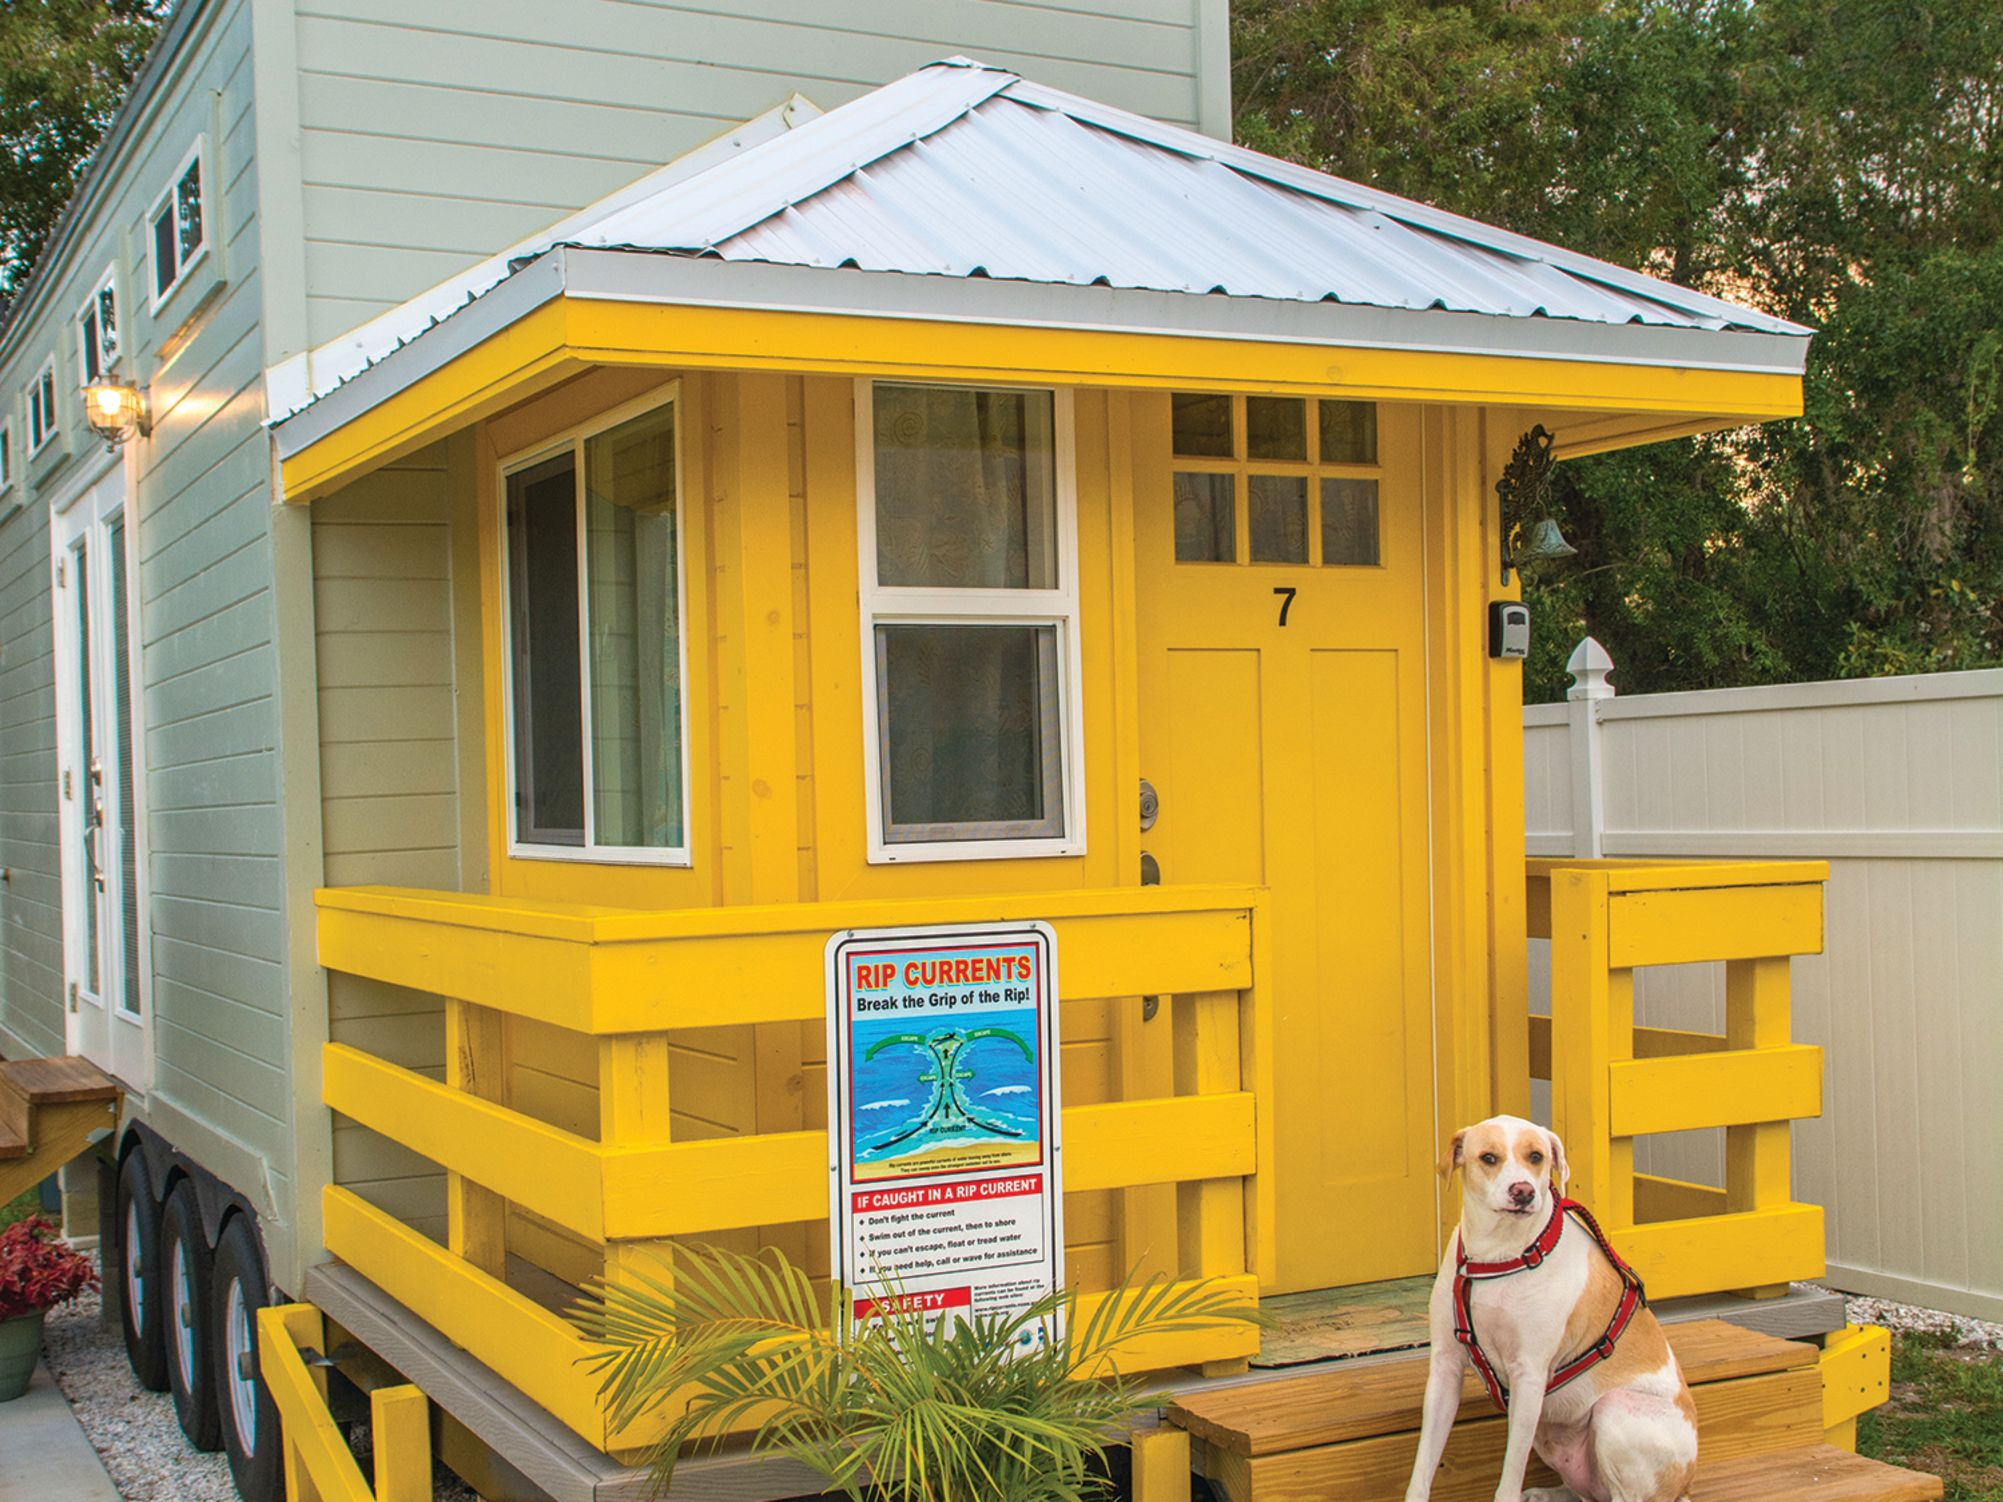 Tinyhouse yellowlifeguardwdog qhuzwz